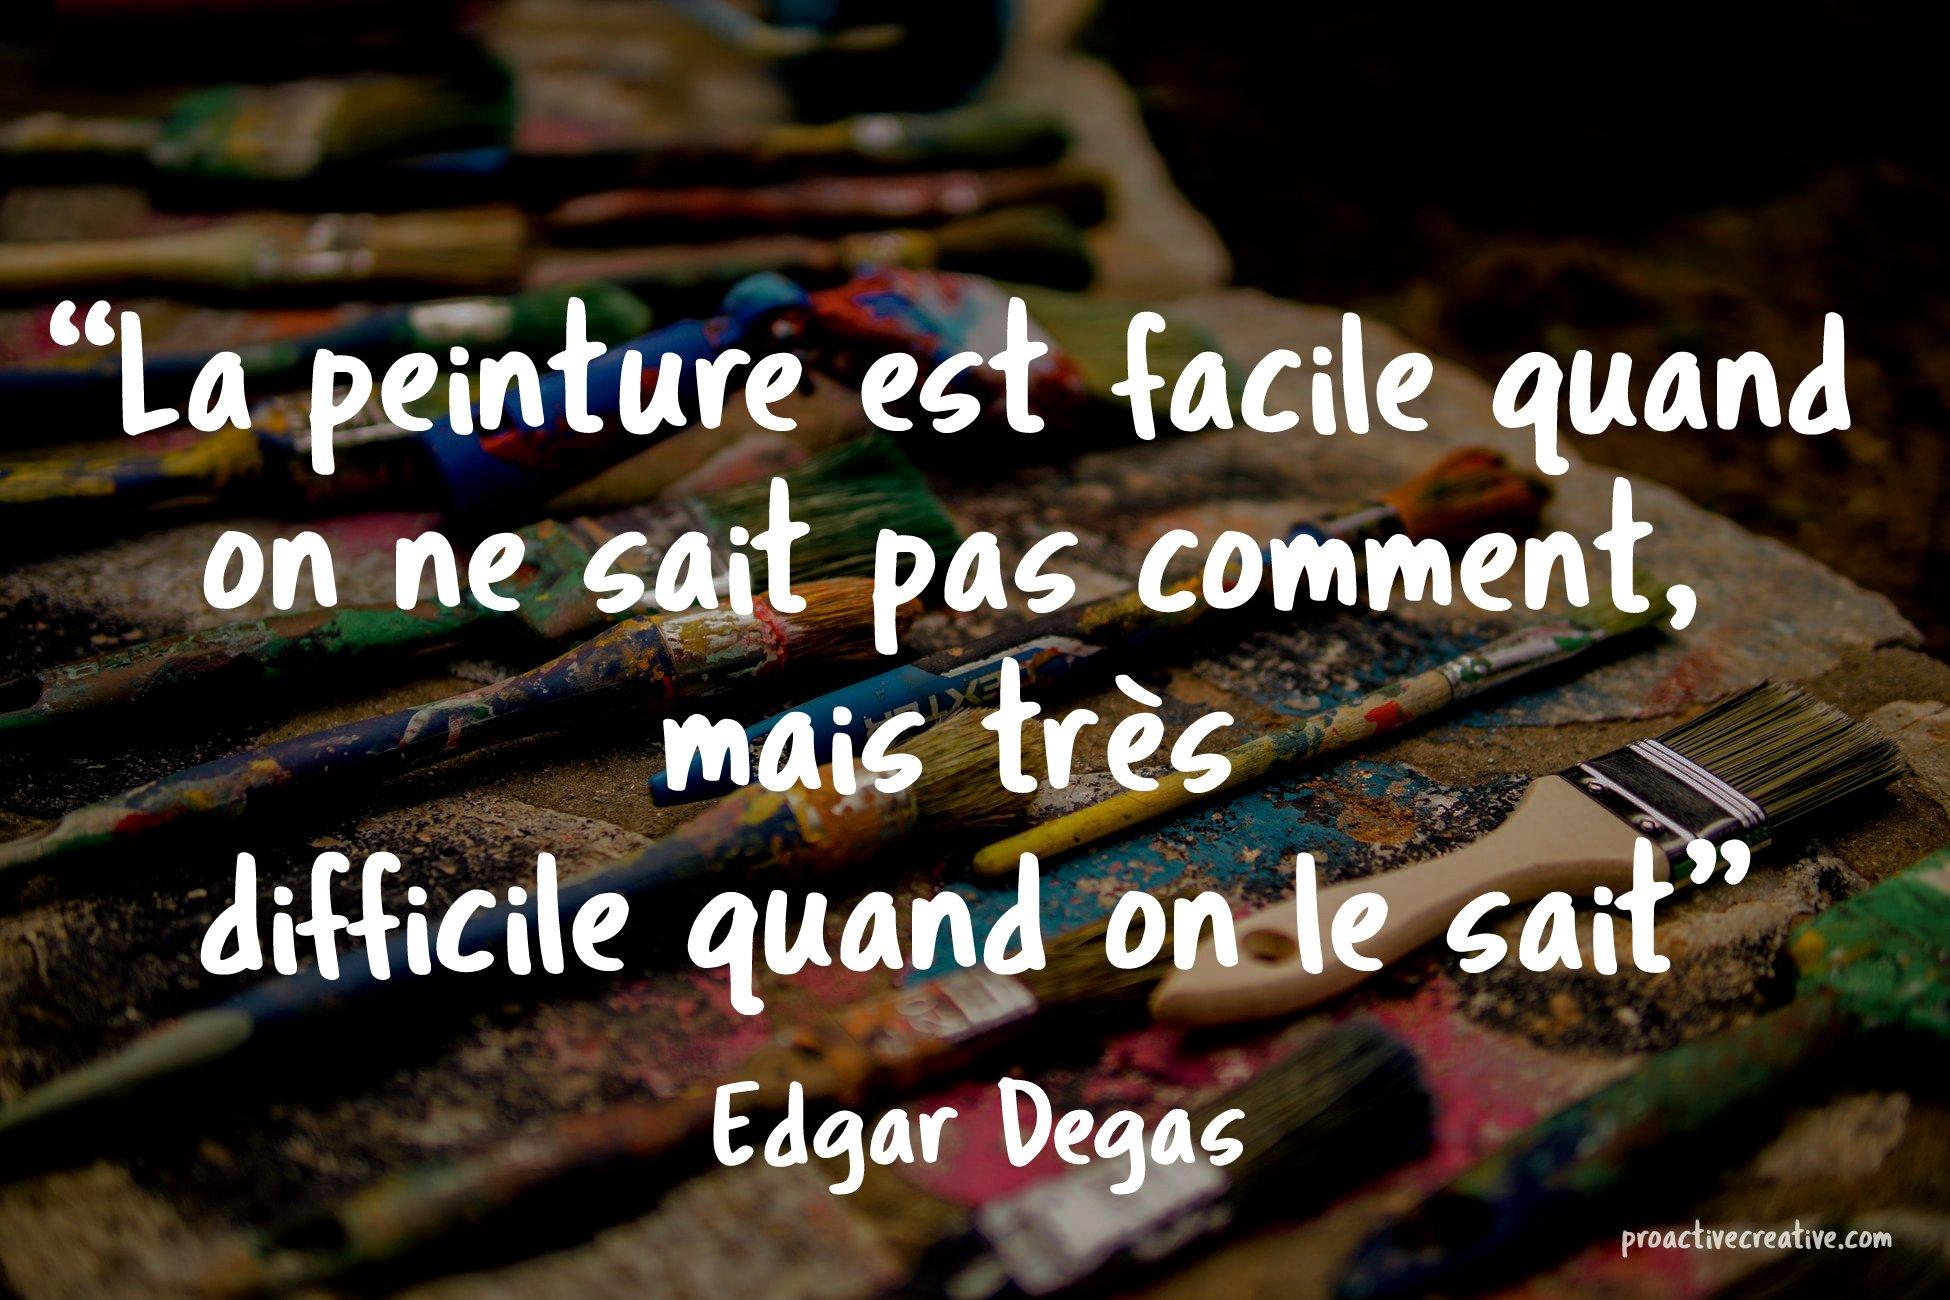 Citations motivantes d'art - Edgar Degas